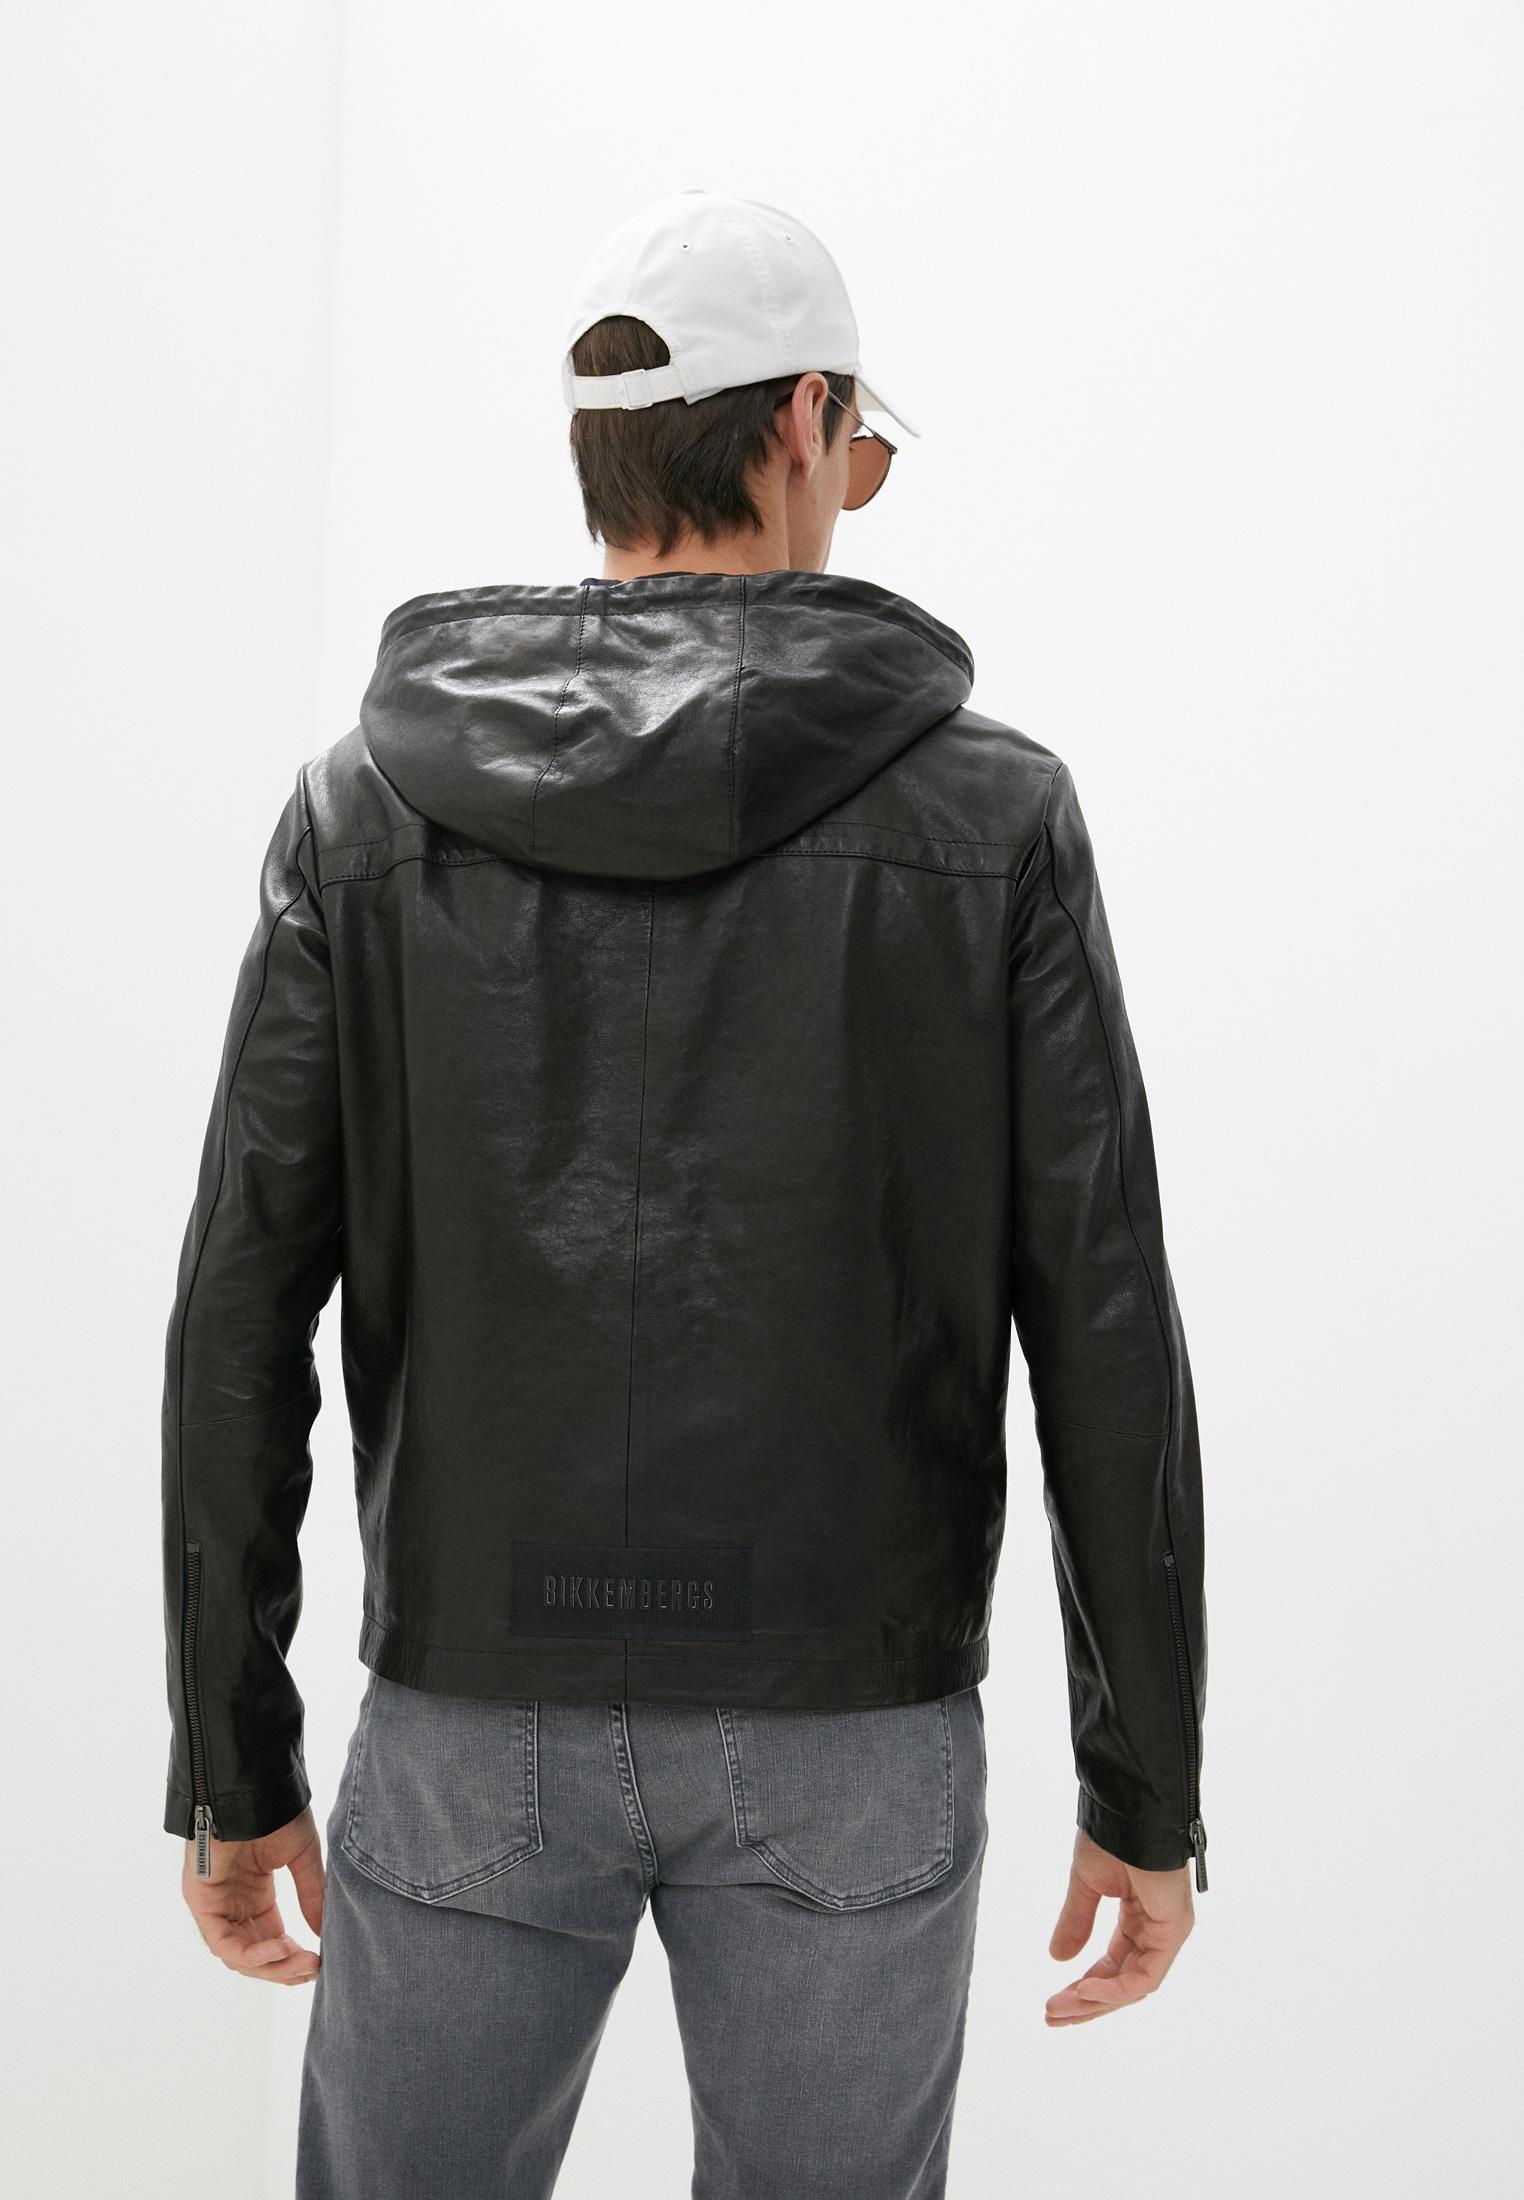 Кожаная куртка Bikkembergs (Биккембергс) C H 201 00 D 1197: изображение 4